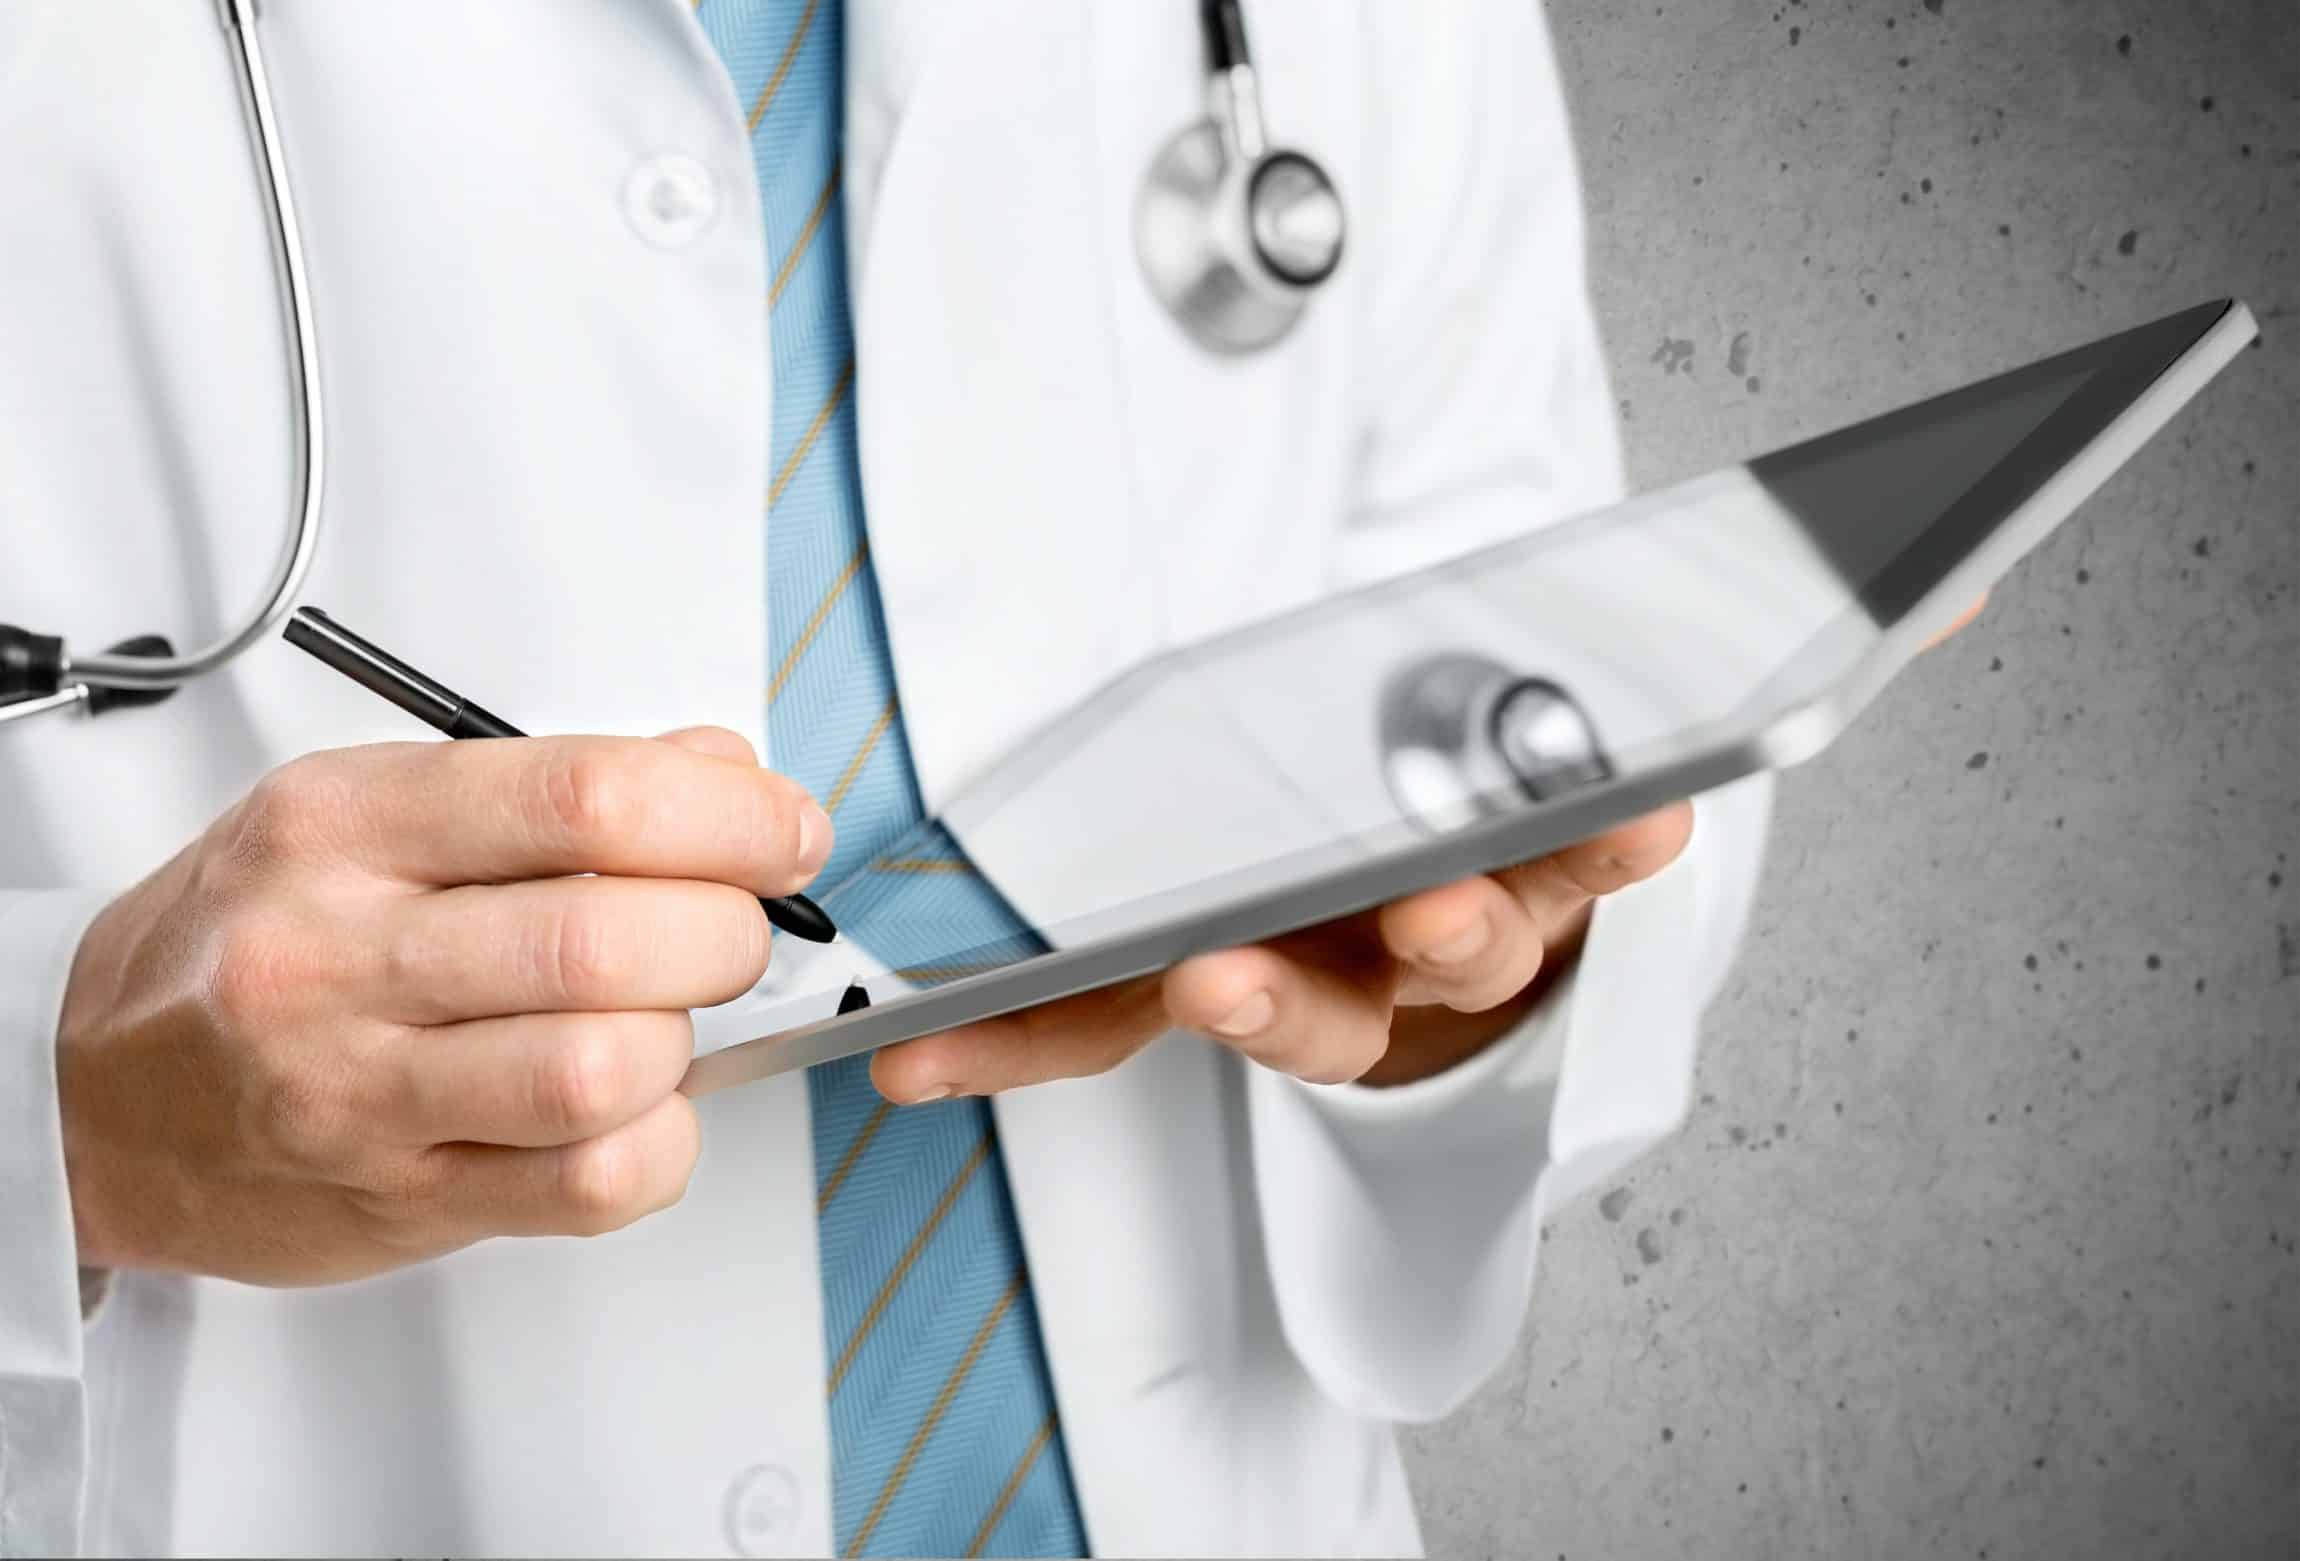 Surgeons On Social Media